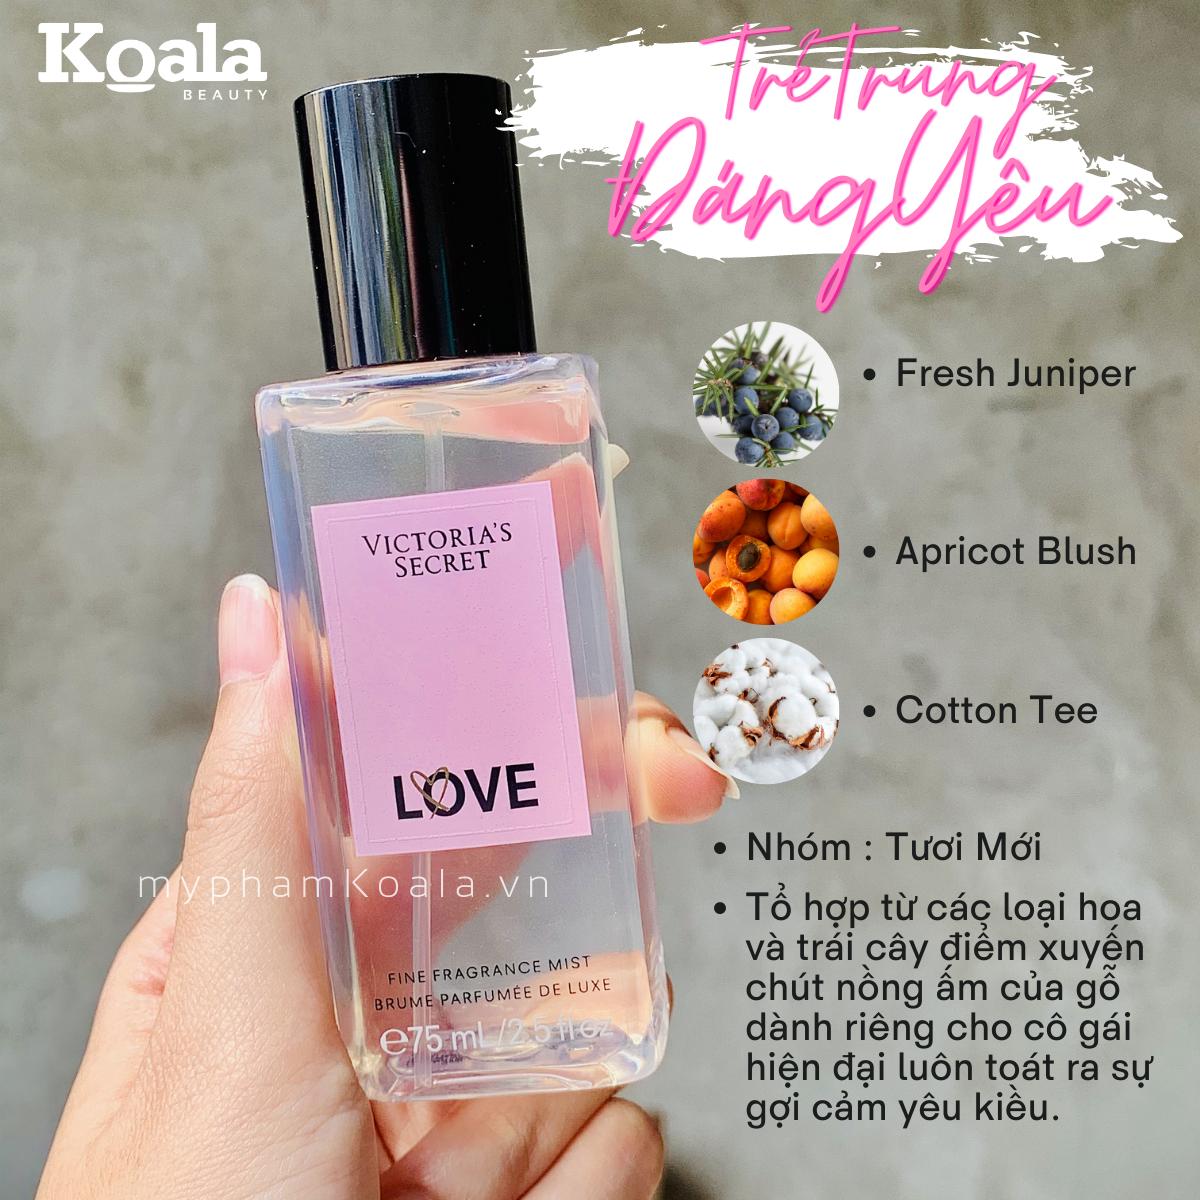 Xịt Body Victoria's Secret LOVE Fine Fragrance Mist 75ml